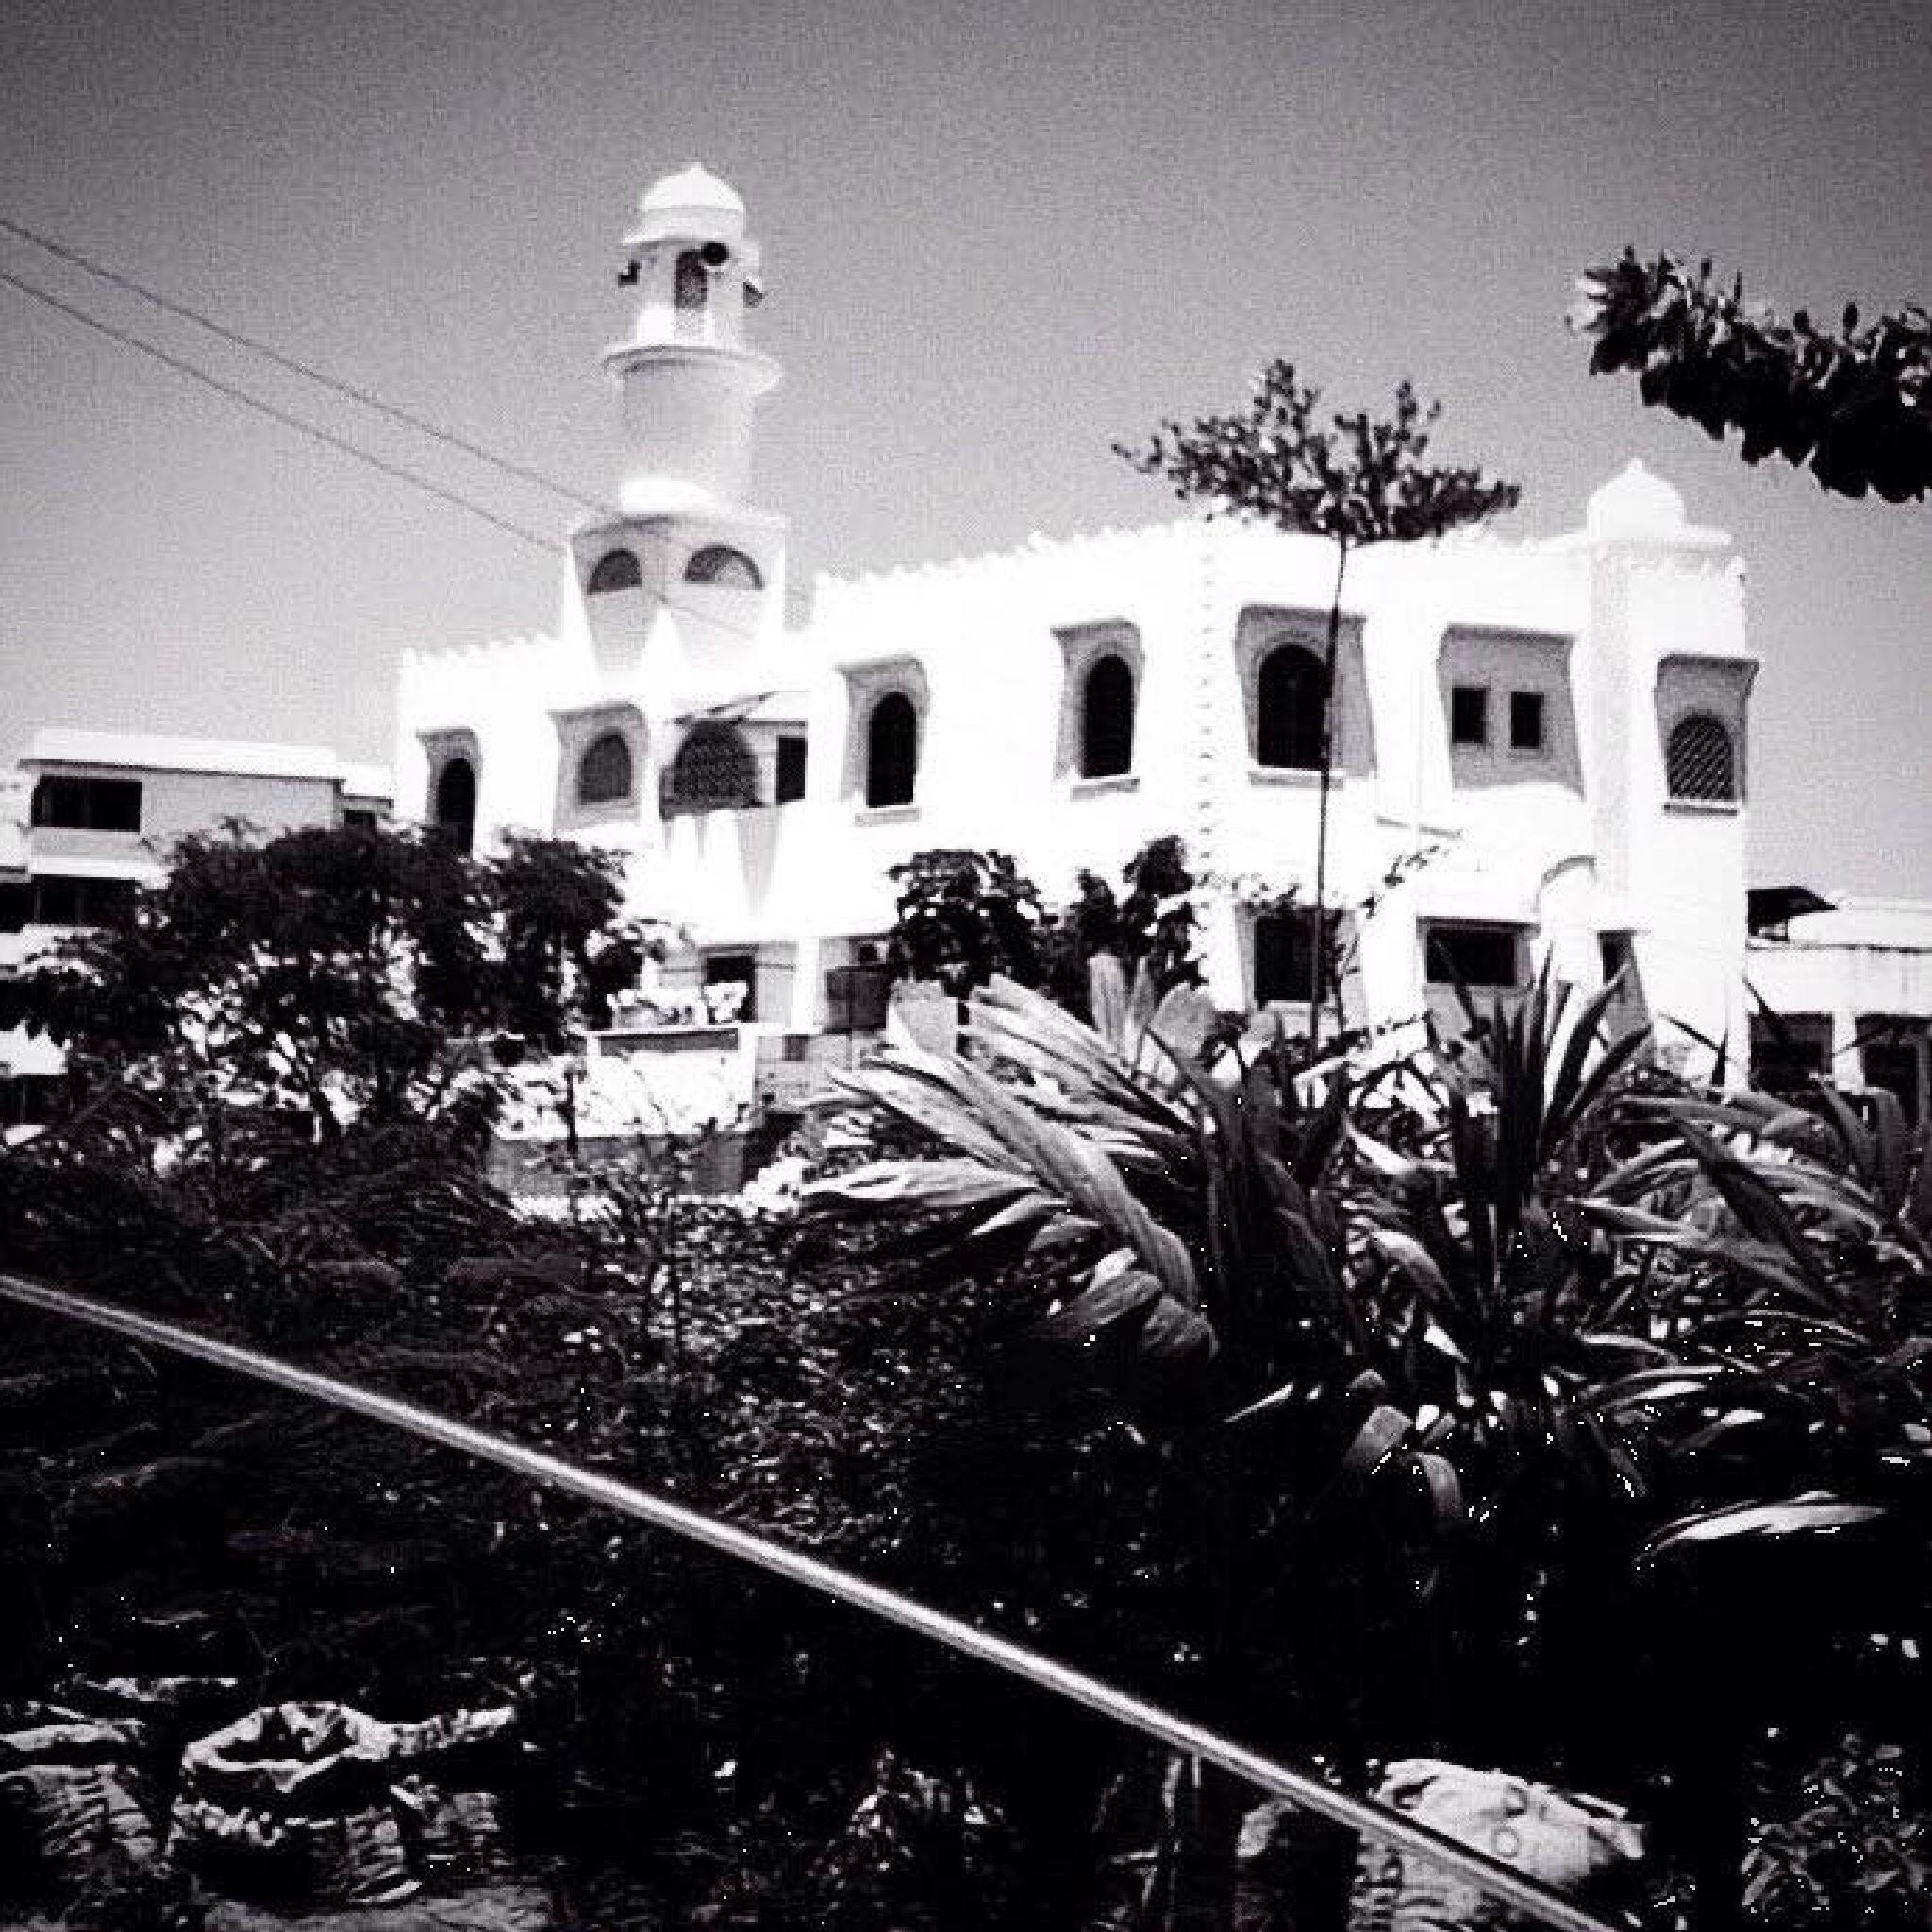 Masjid Ebrahim by Mustafa Adamji